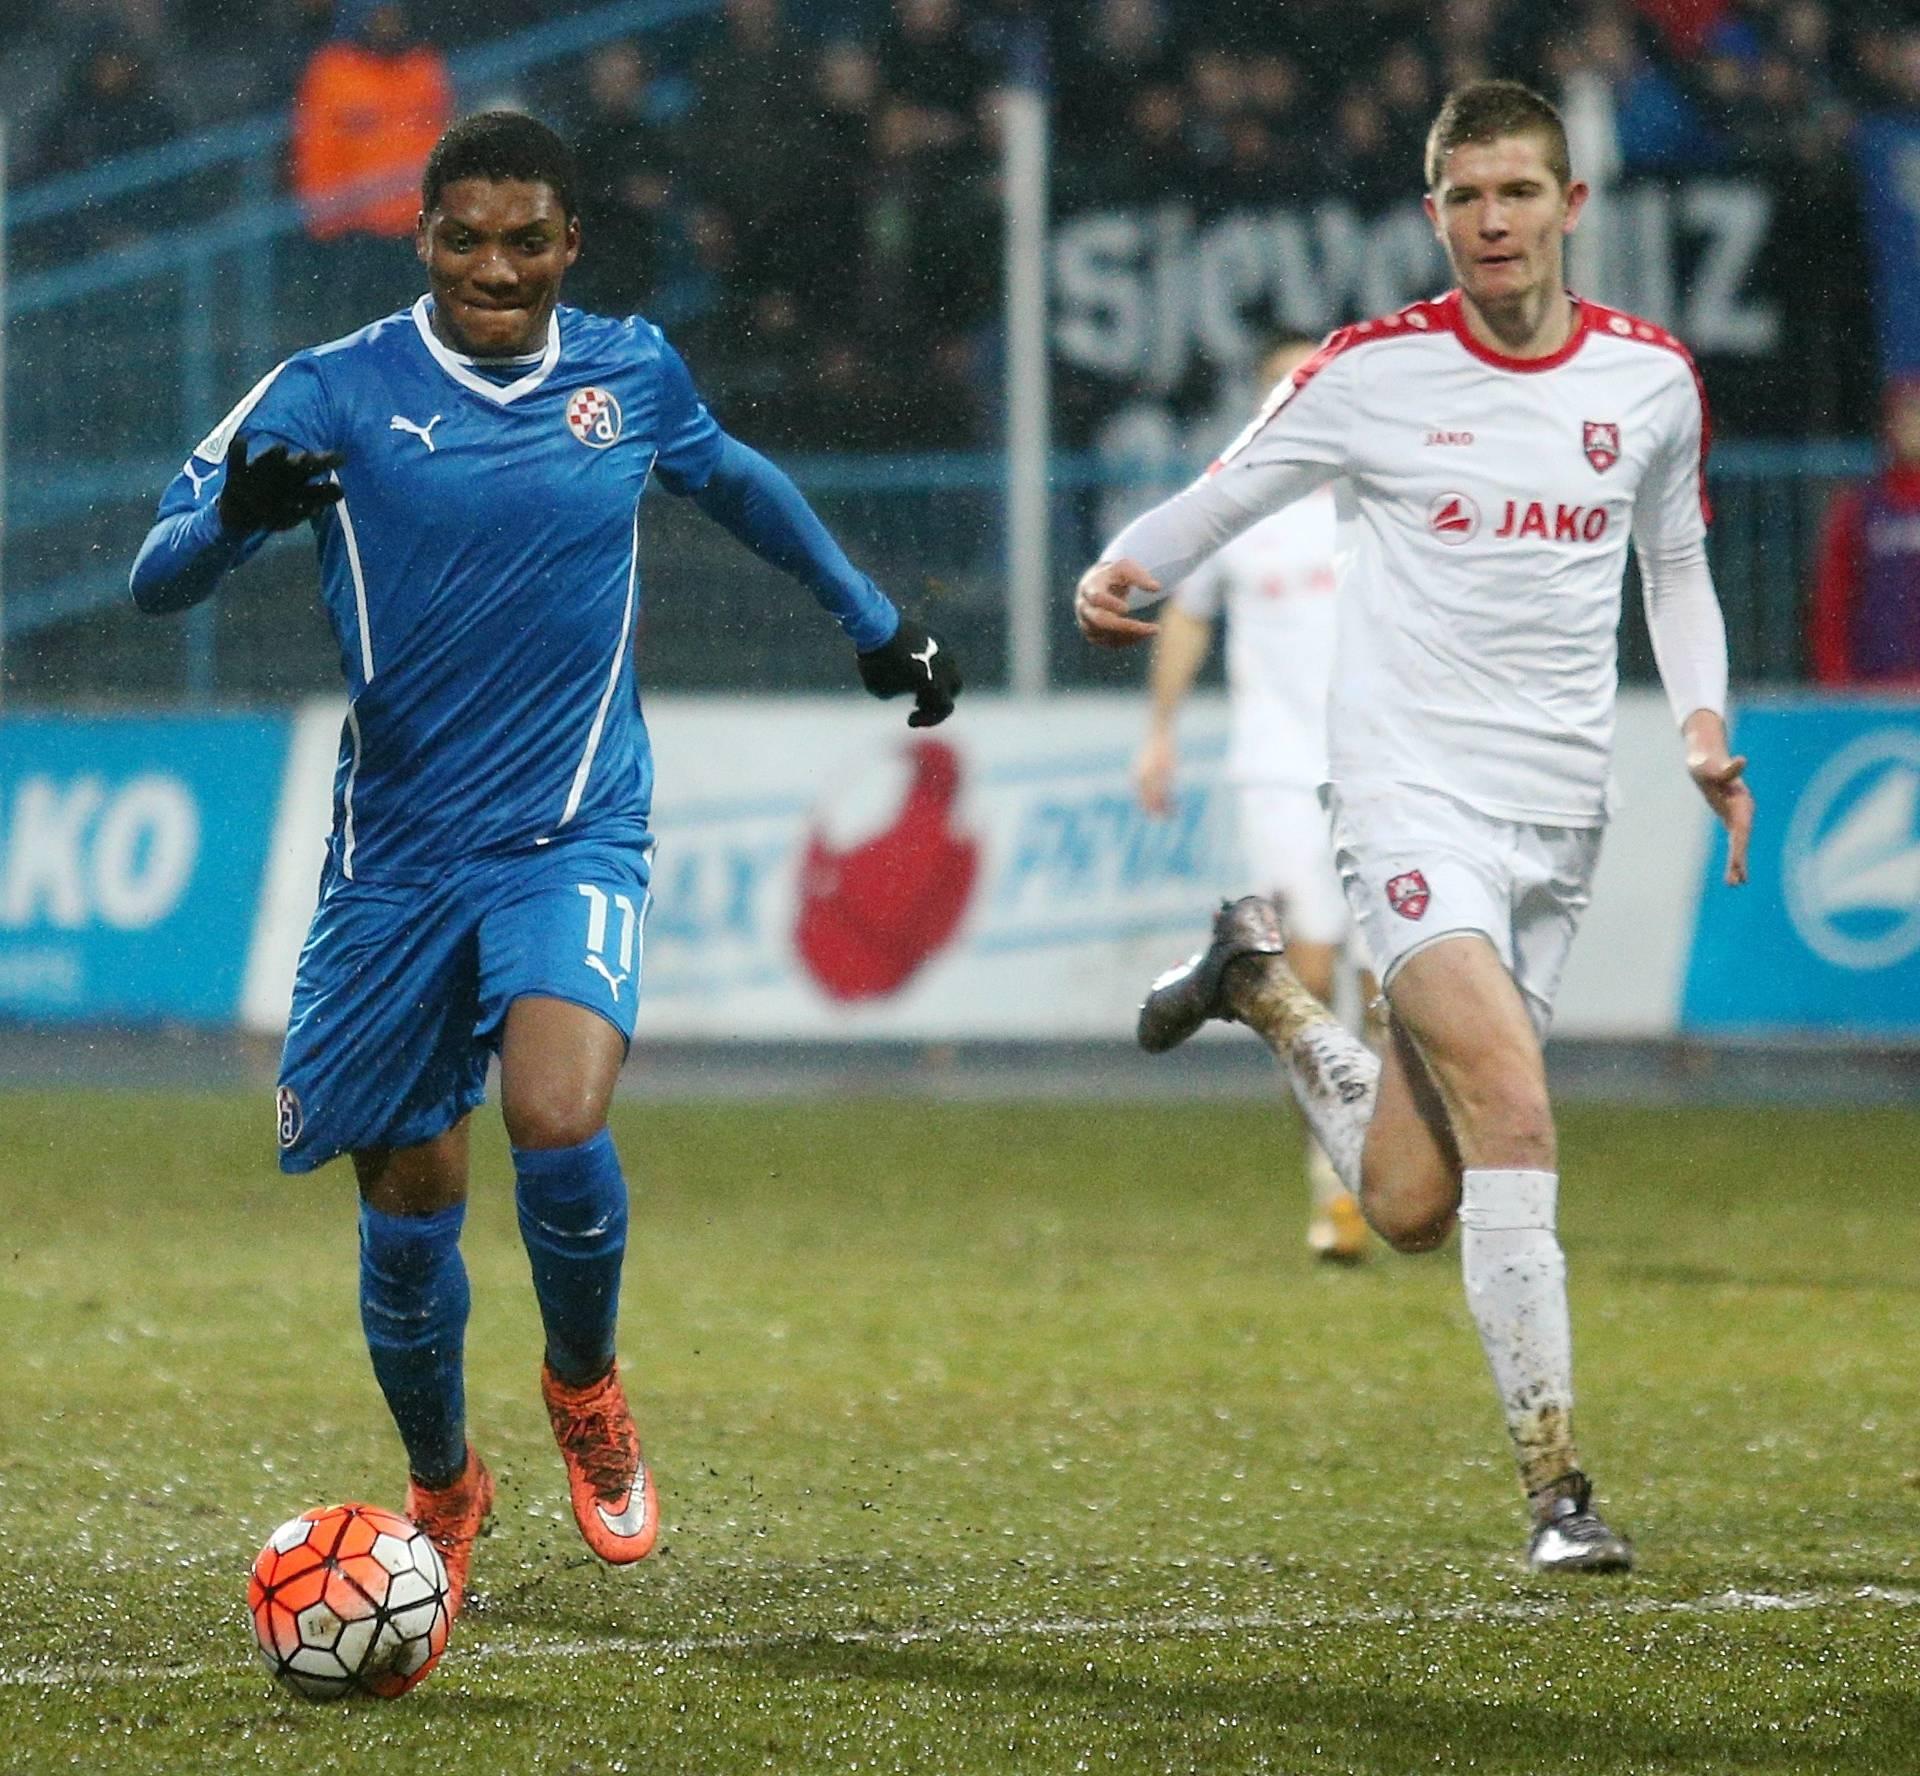 Dinamov preokret u 4 minute za povratak na vrh Prve HNL